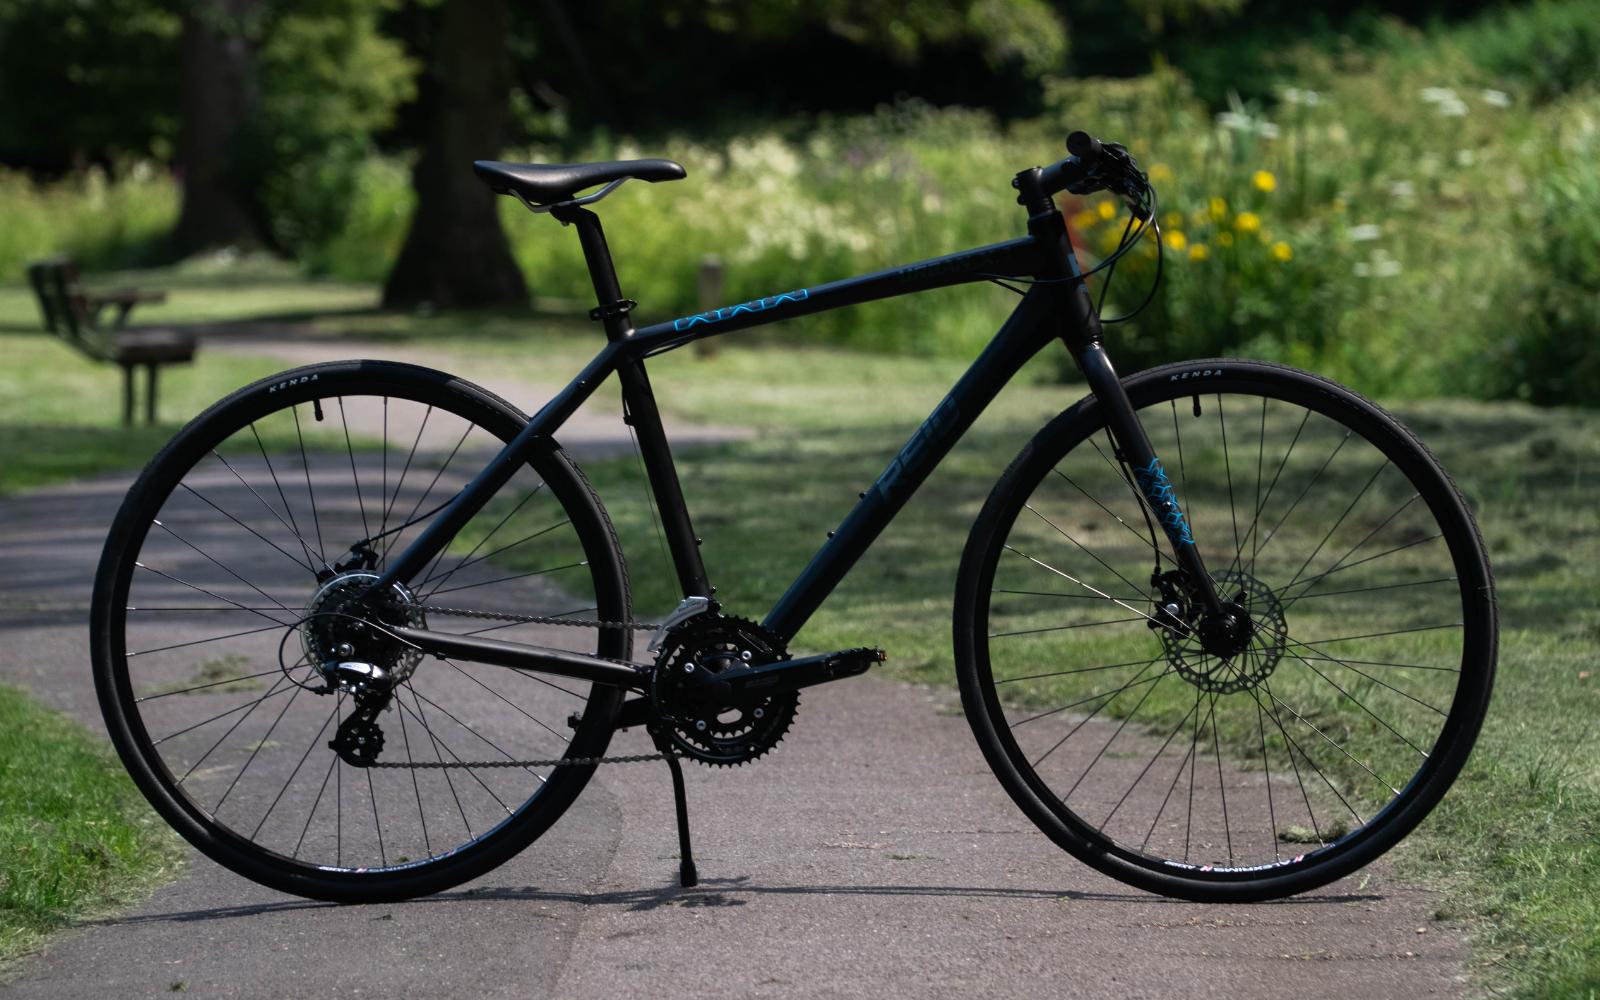 84 1 - Reid ® - Urban X1 Bike